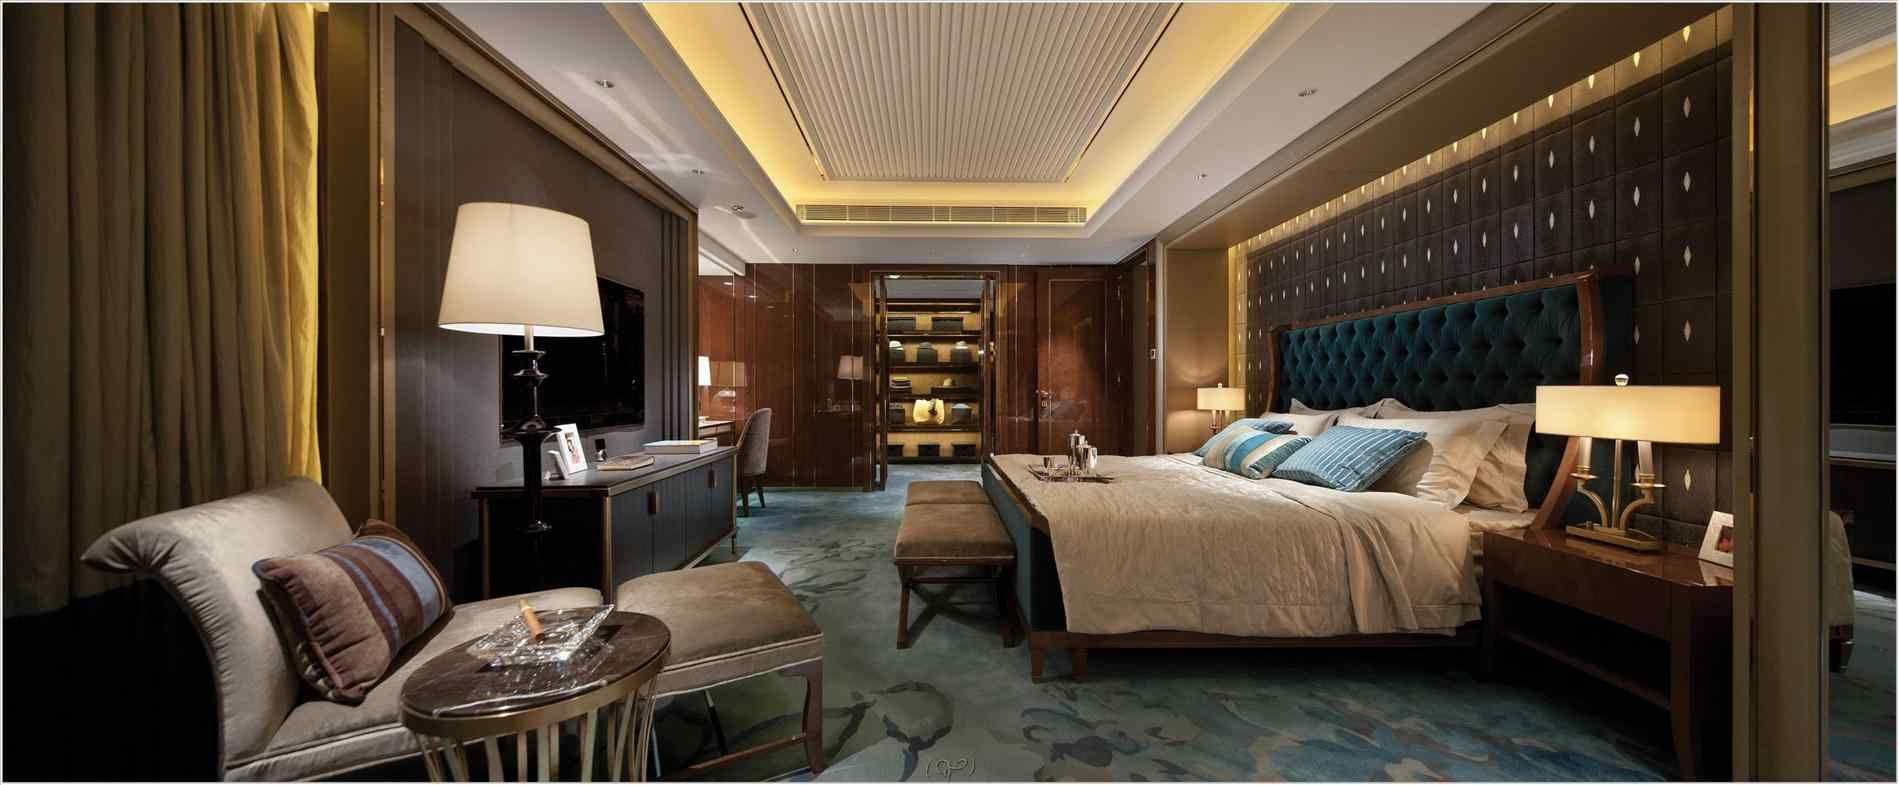 Luxury Master Bedrooms Celebrity Homes Luxury Bedroom Master